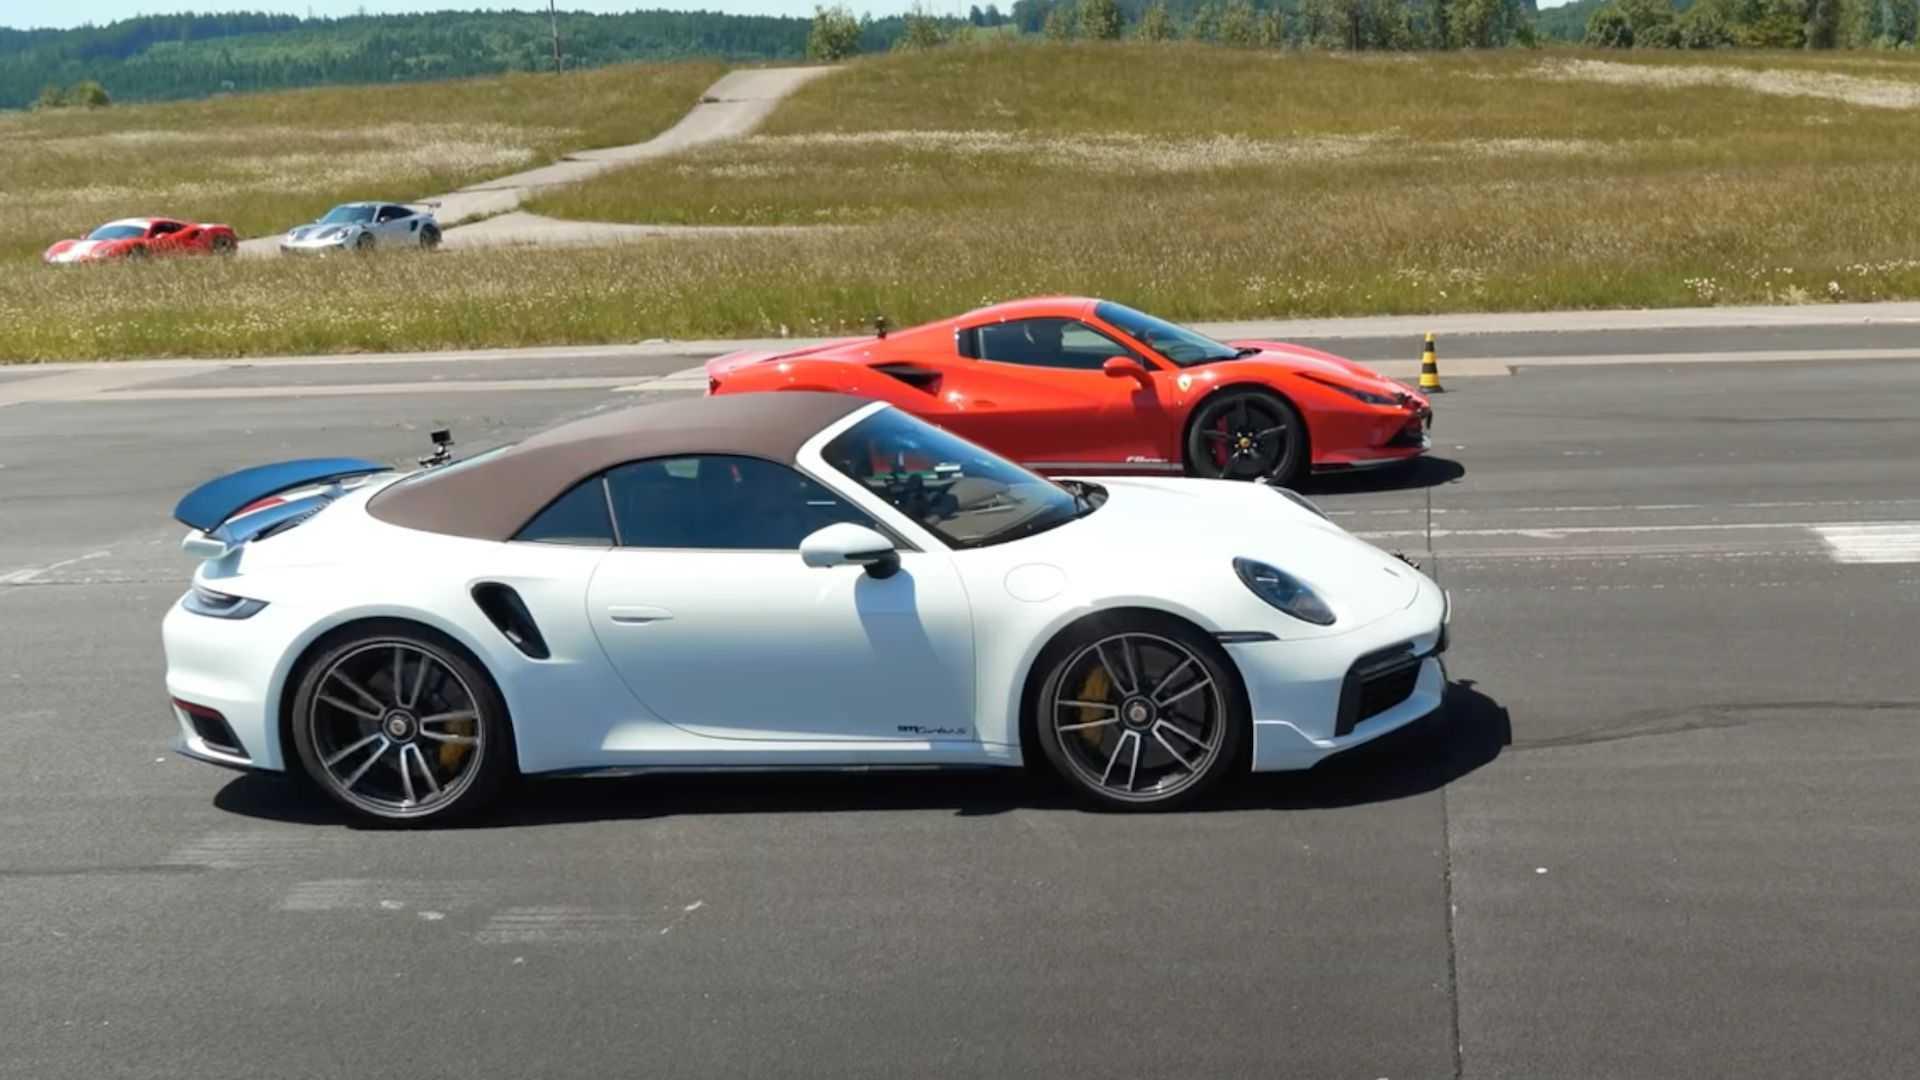 Ferrari F8 Drag Races Porsche 911 Turbo S In Fast Convertible Battle